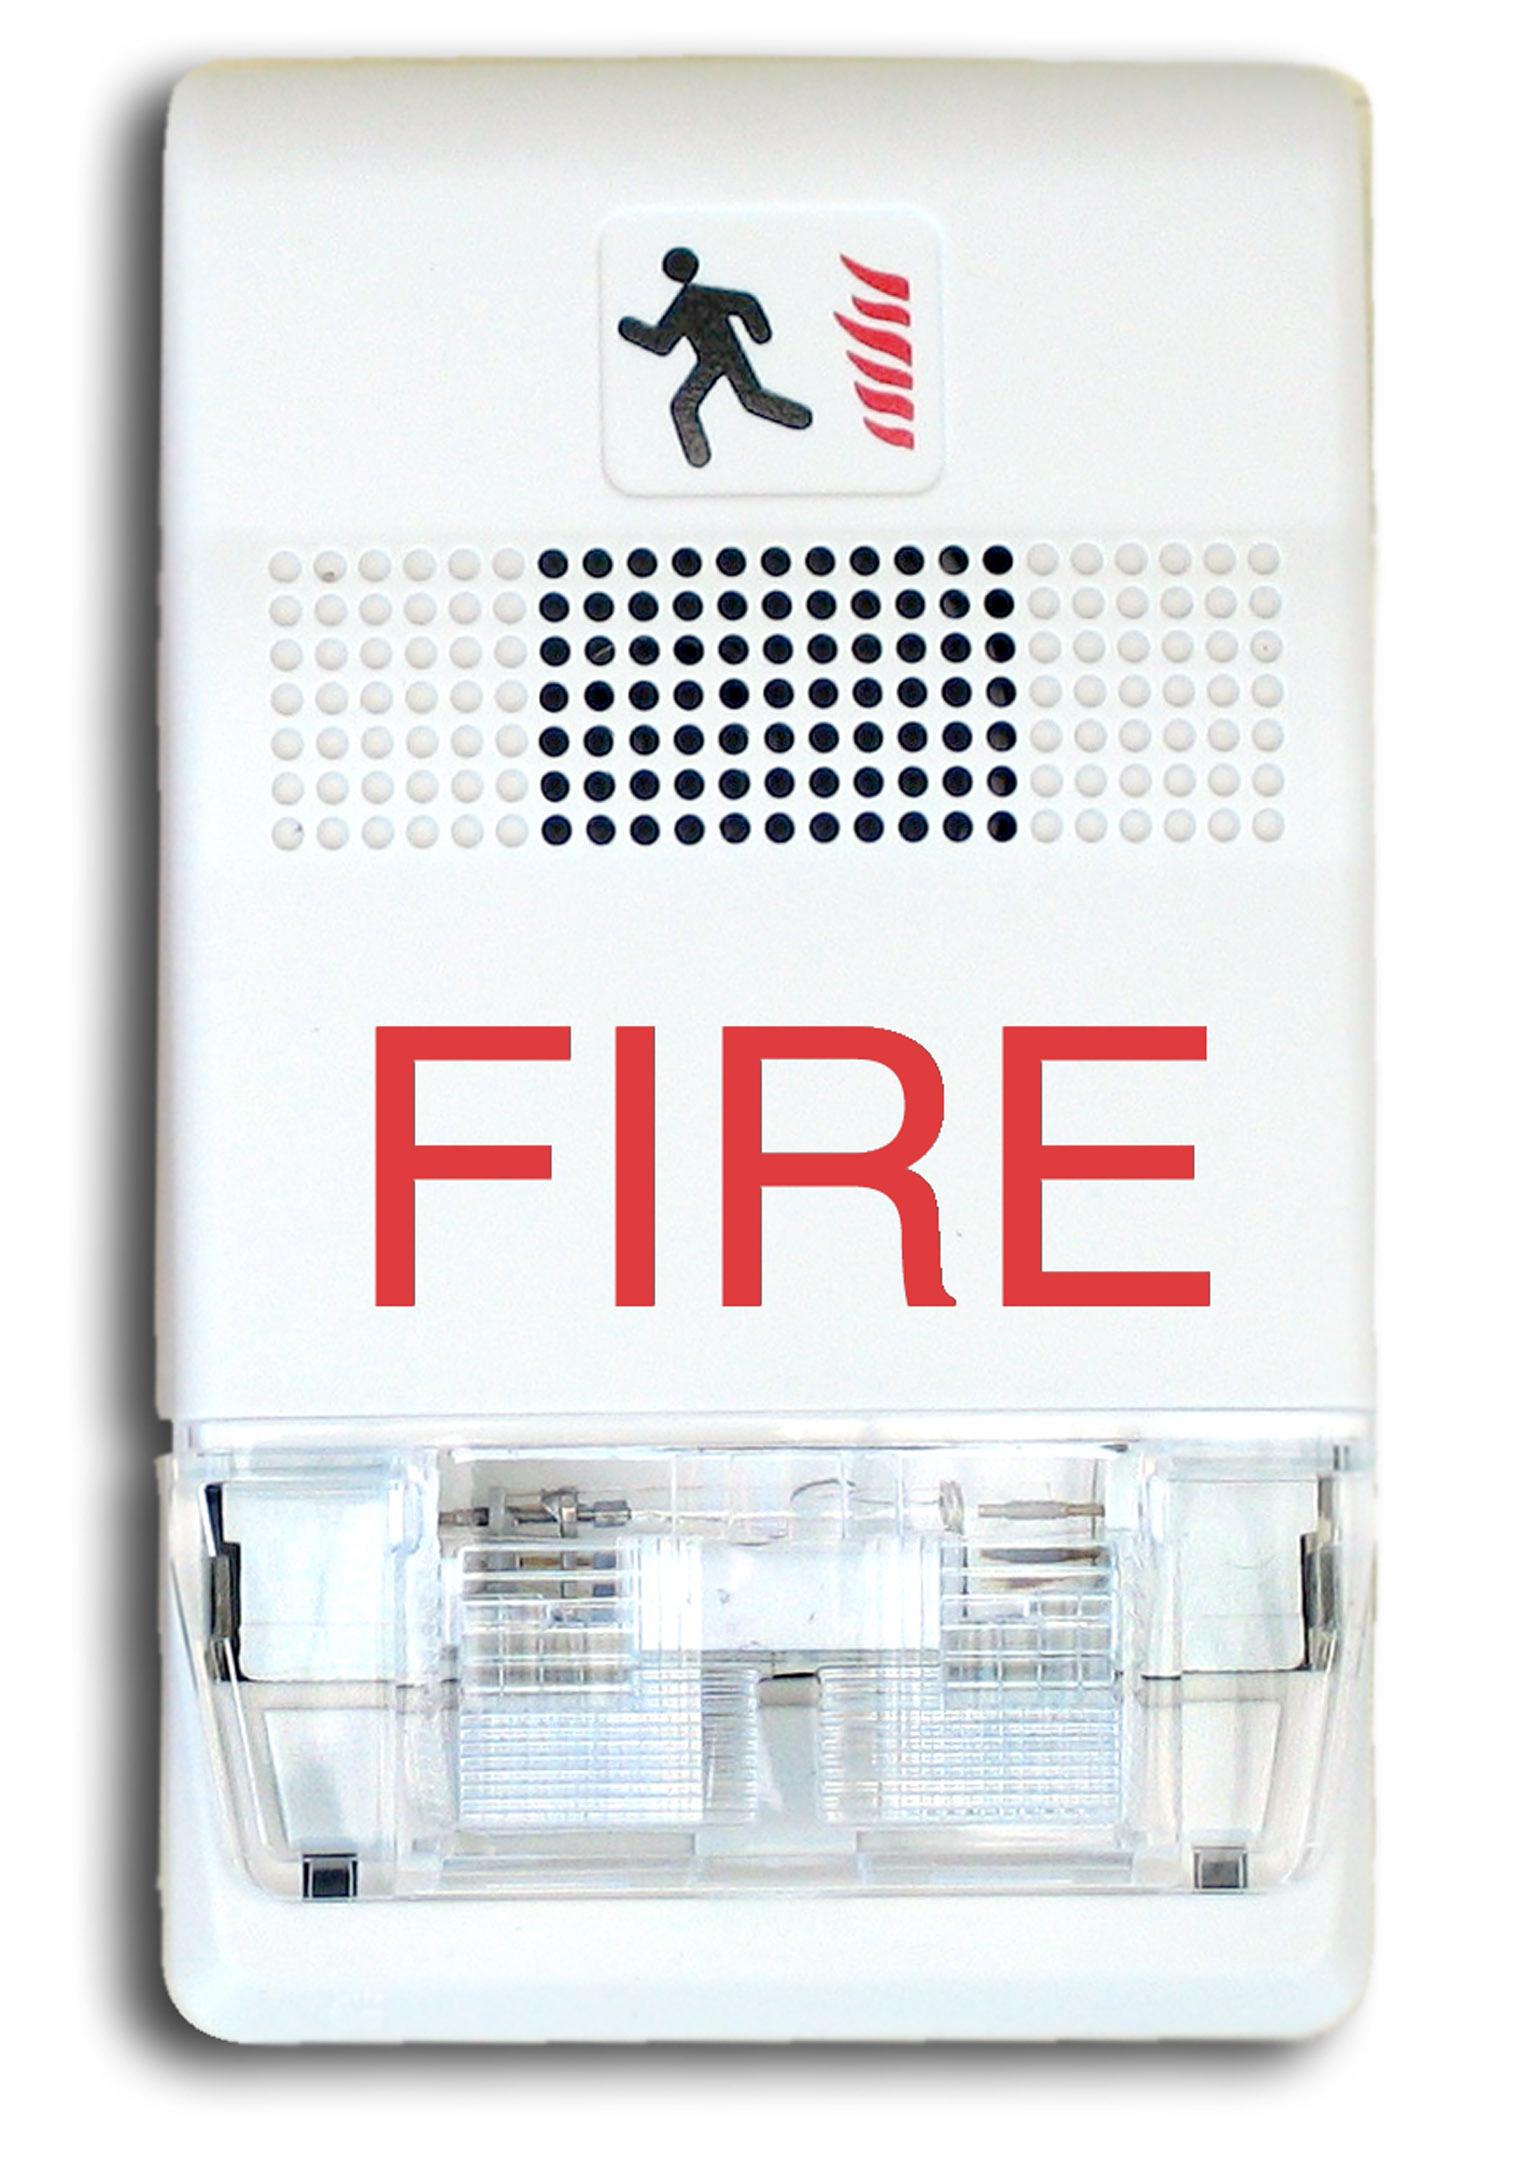 Fire Alarm System Edwards Photos